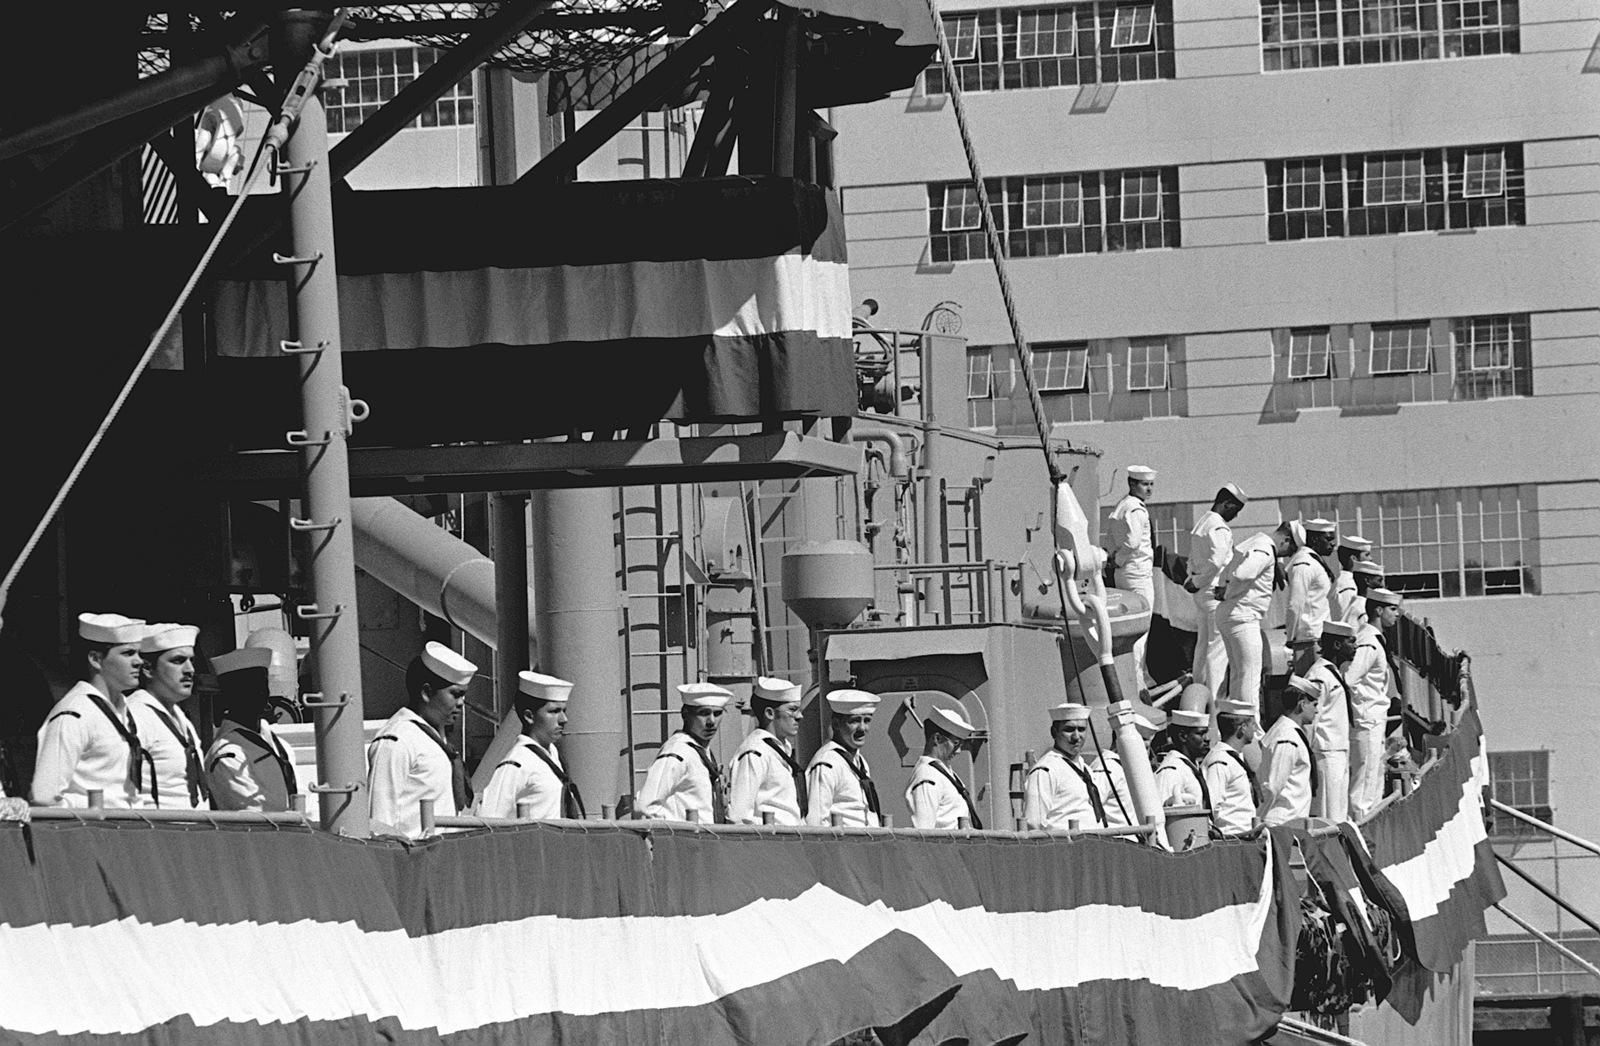 The crew of the small repair ship USS SPHINX (ARL 24) man